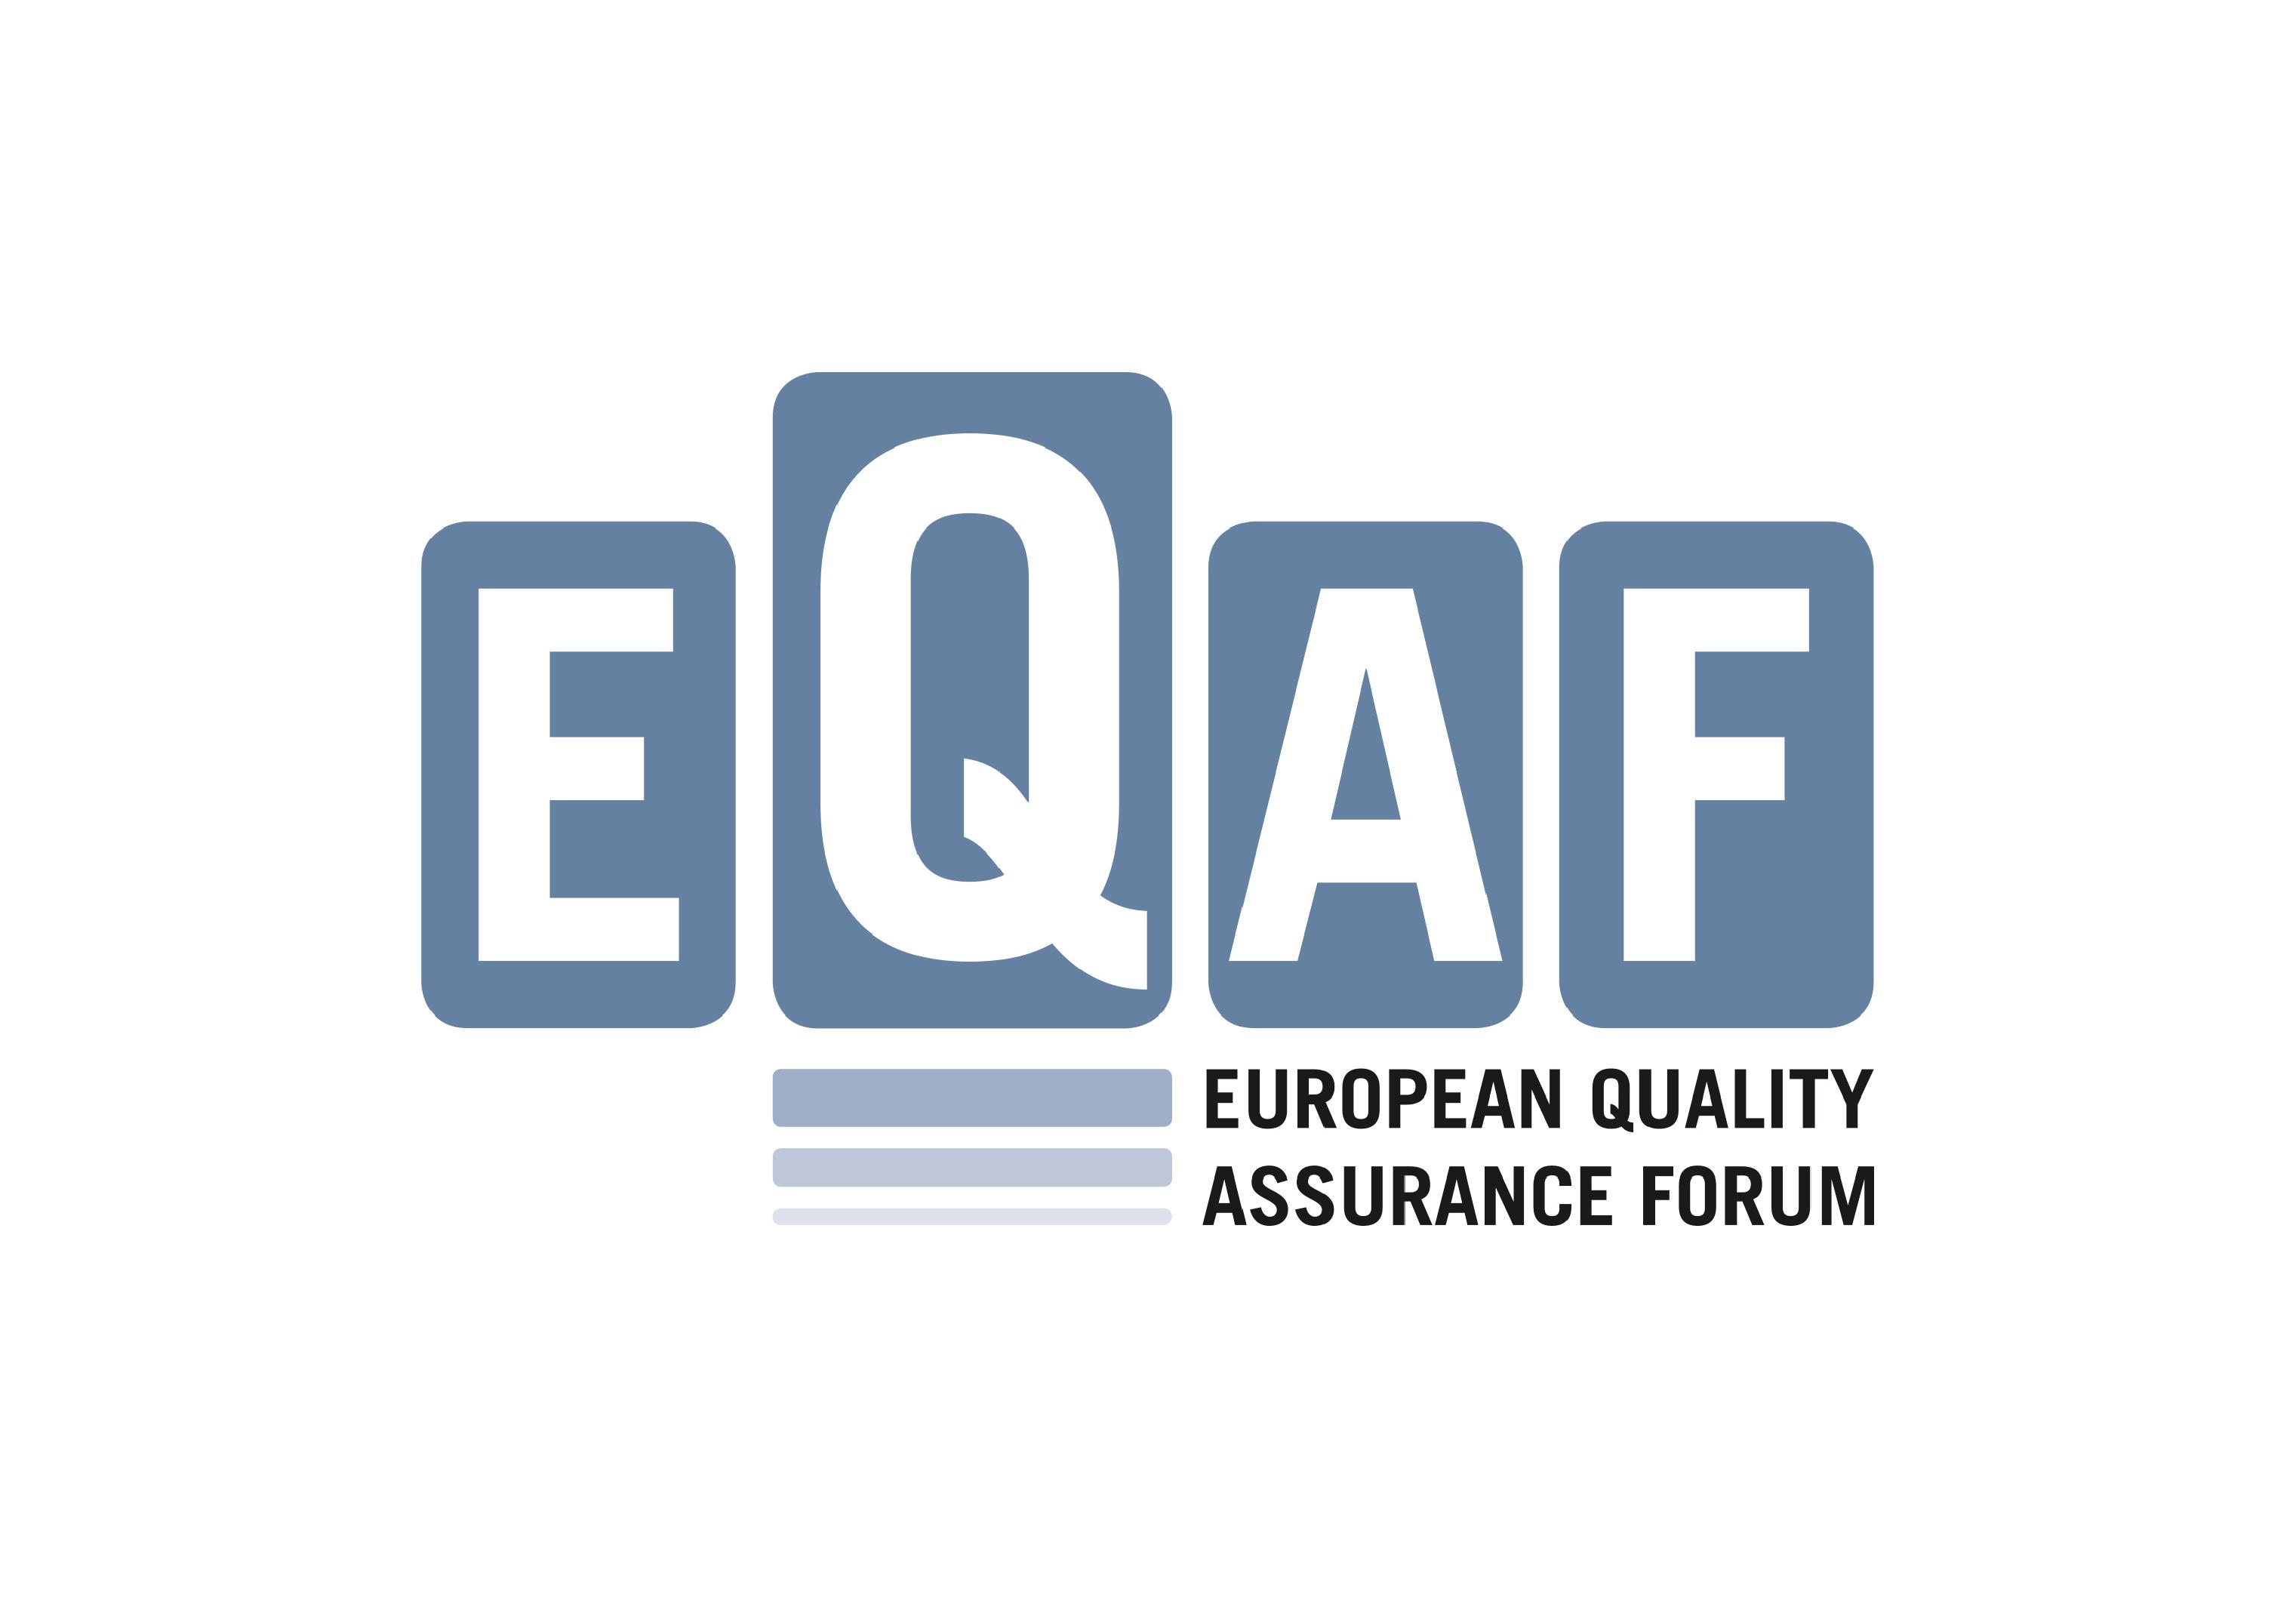 14th European Quality Assurance Forum (EQAF)